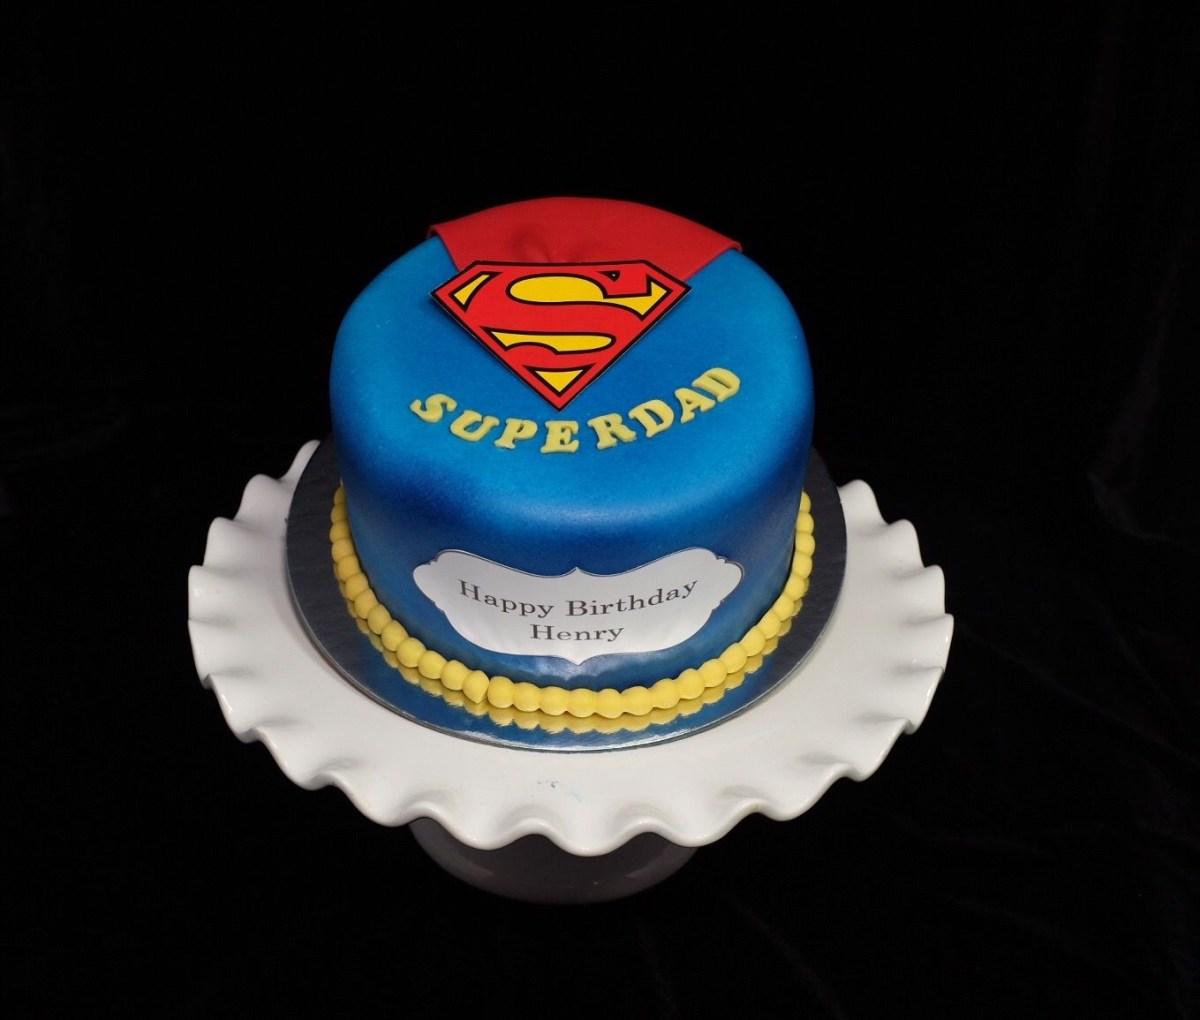 Surprising Birthday Cake For Dad Superdad Cake Father Day Pinterest Cake Dad Funny Birthday Cards Online Alyptdamsfinfo